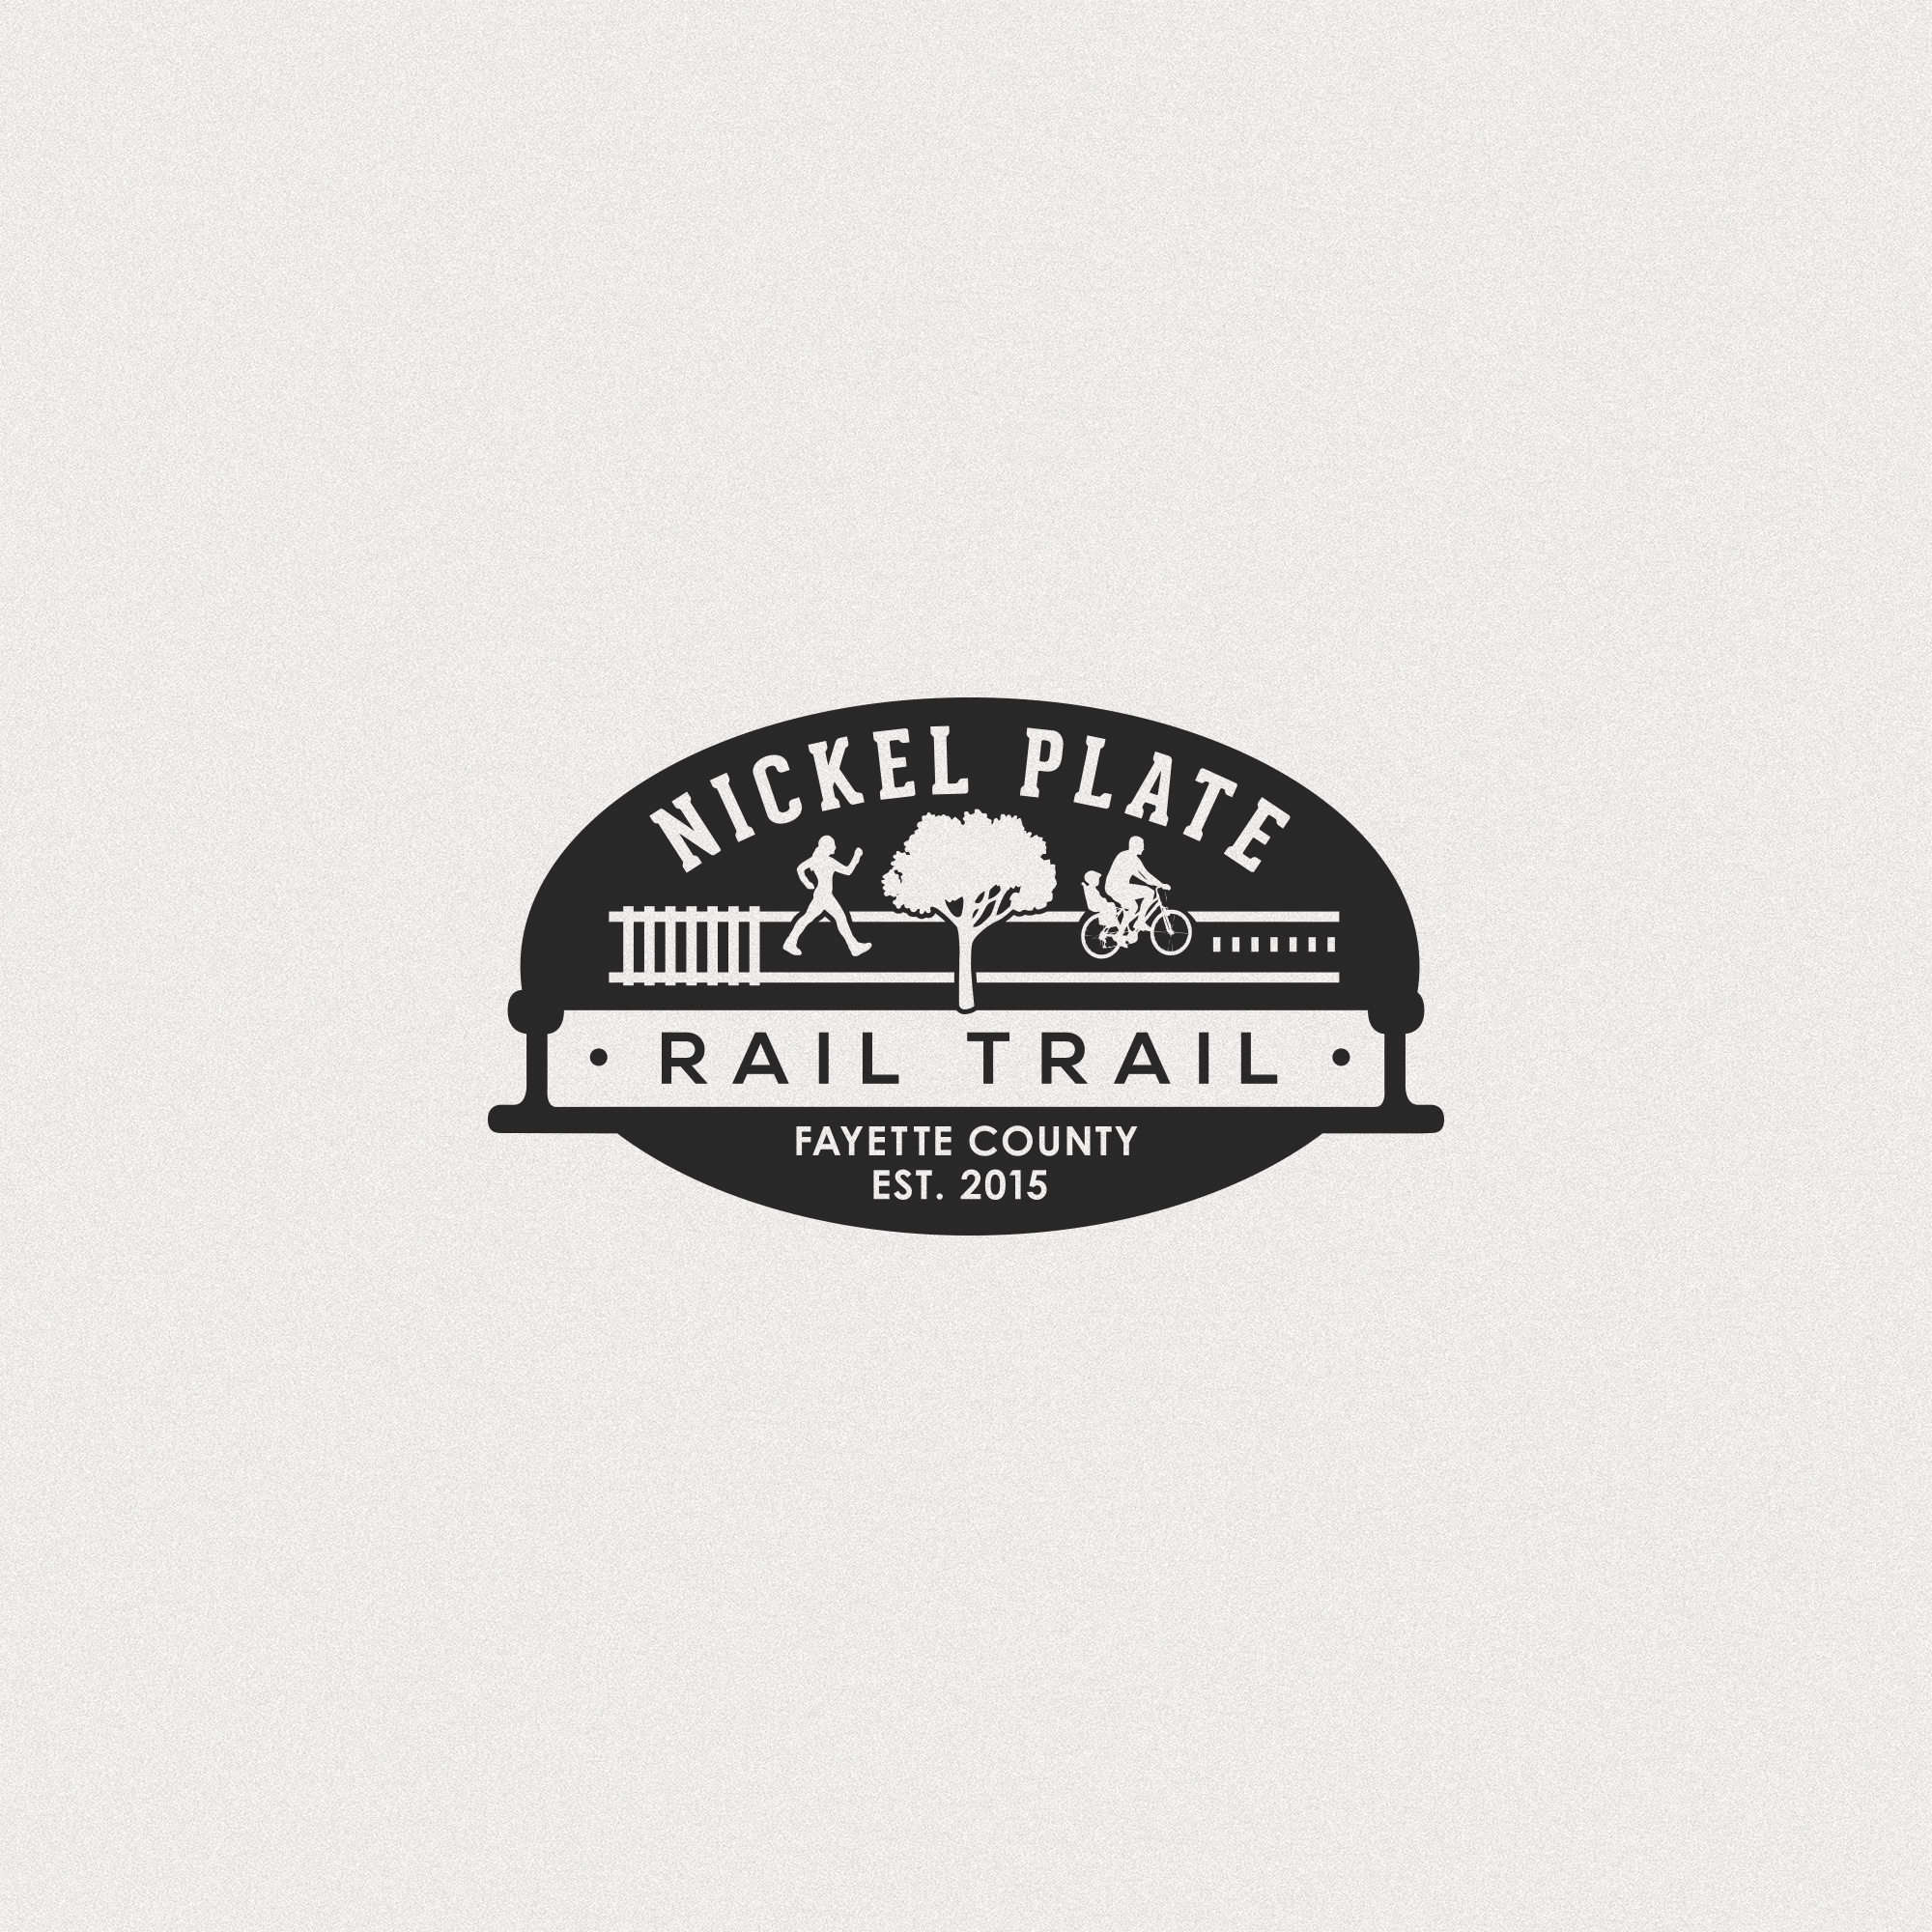 Rail Trail Logo Design